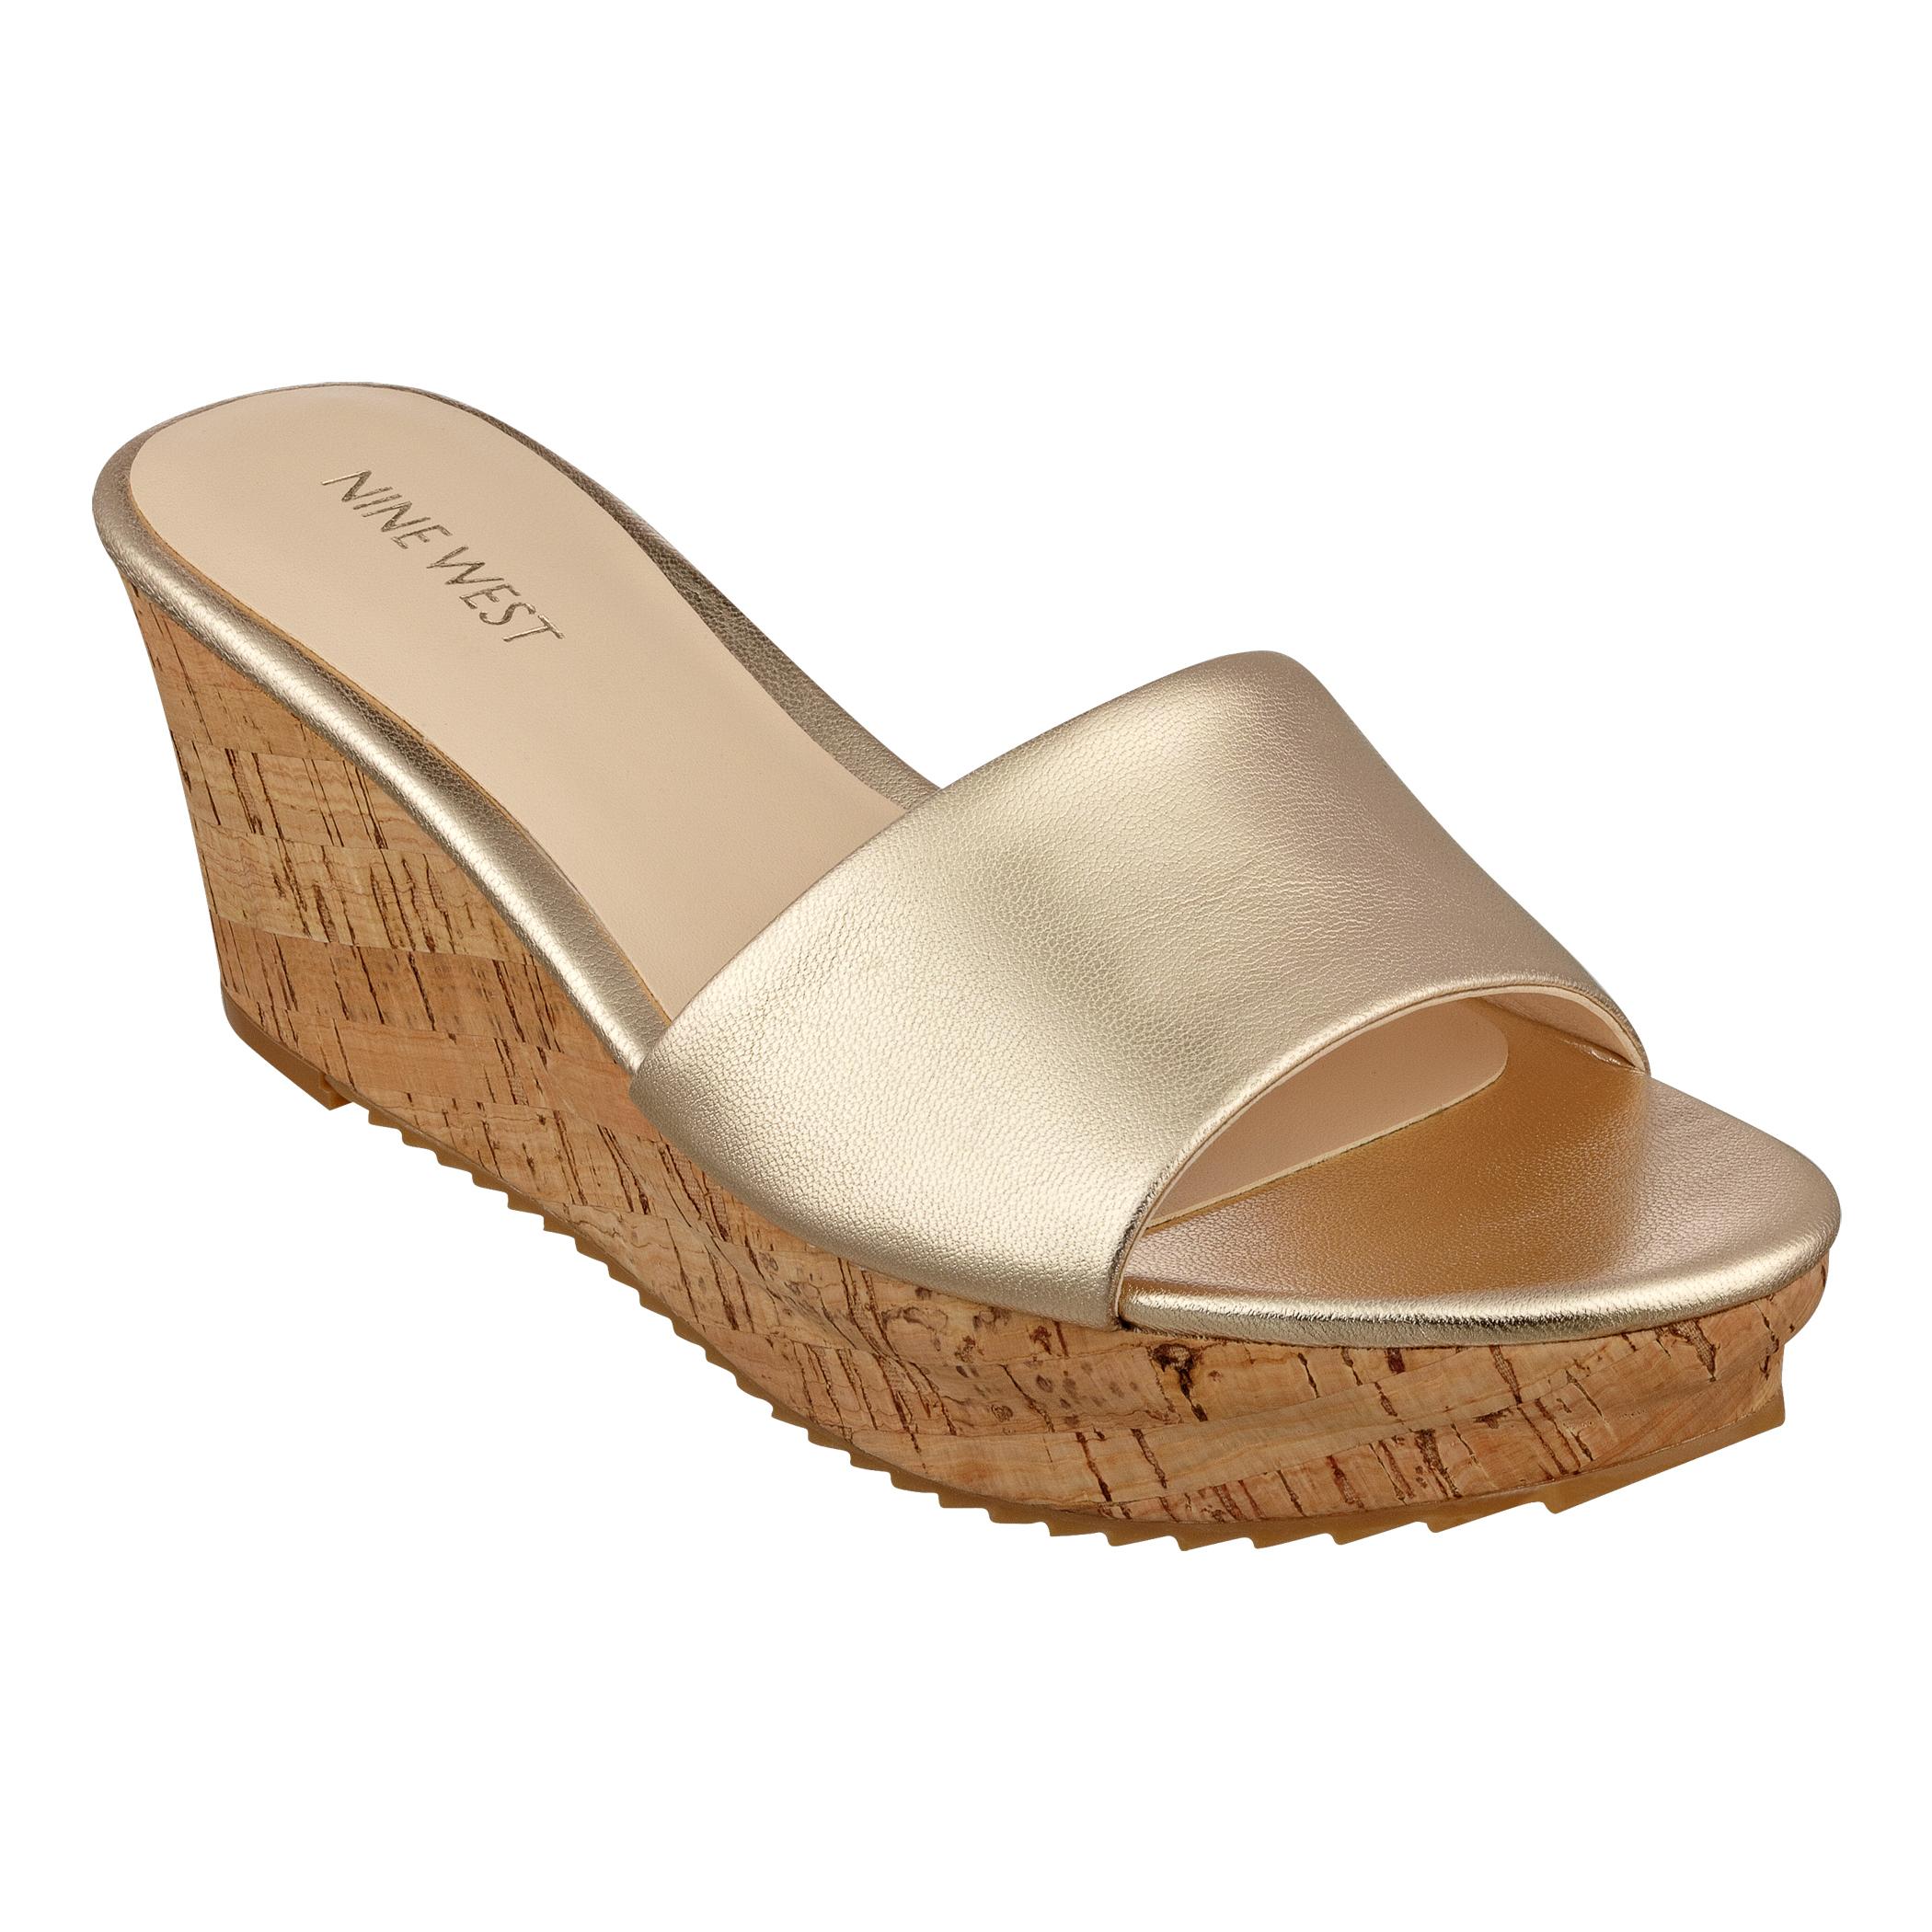 e81819842e3 Lyst - Nine West Confetty Wedge Sandals in Metallic